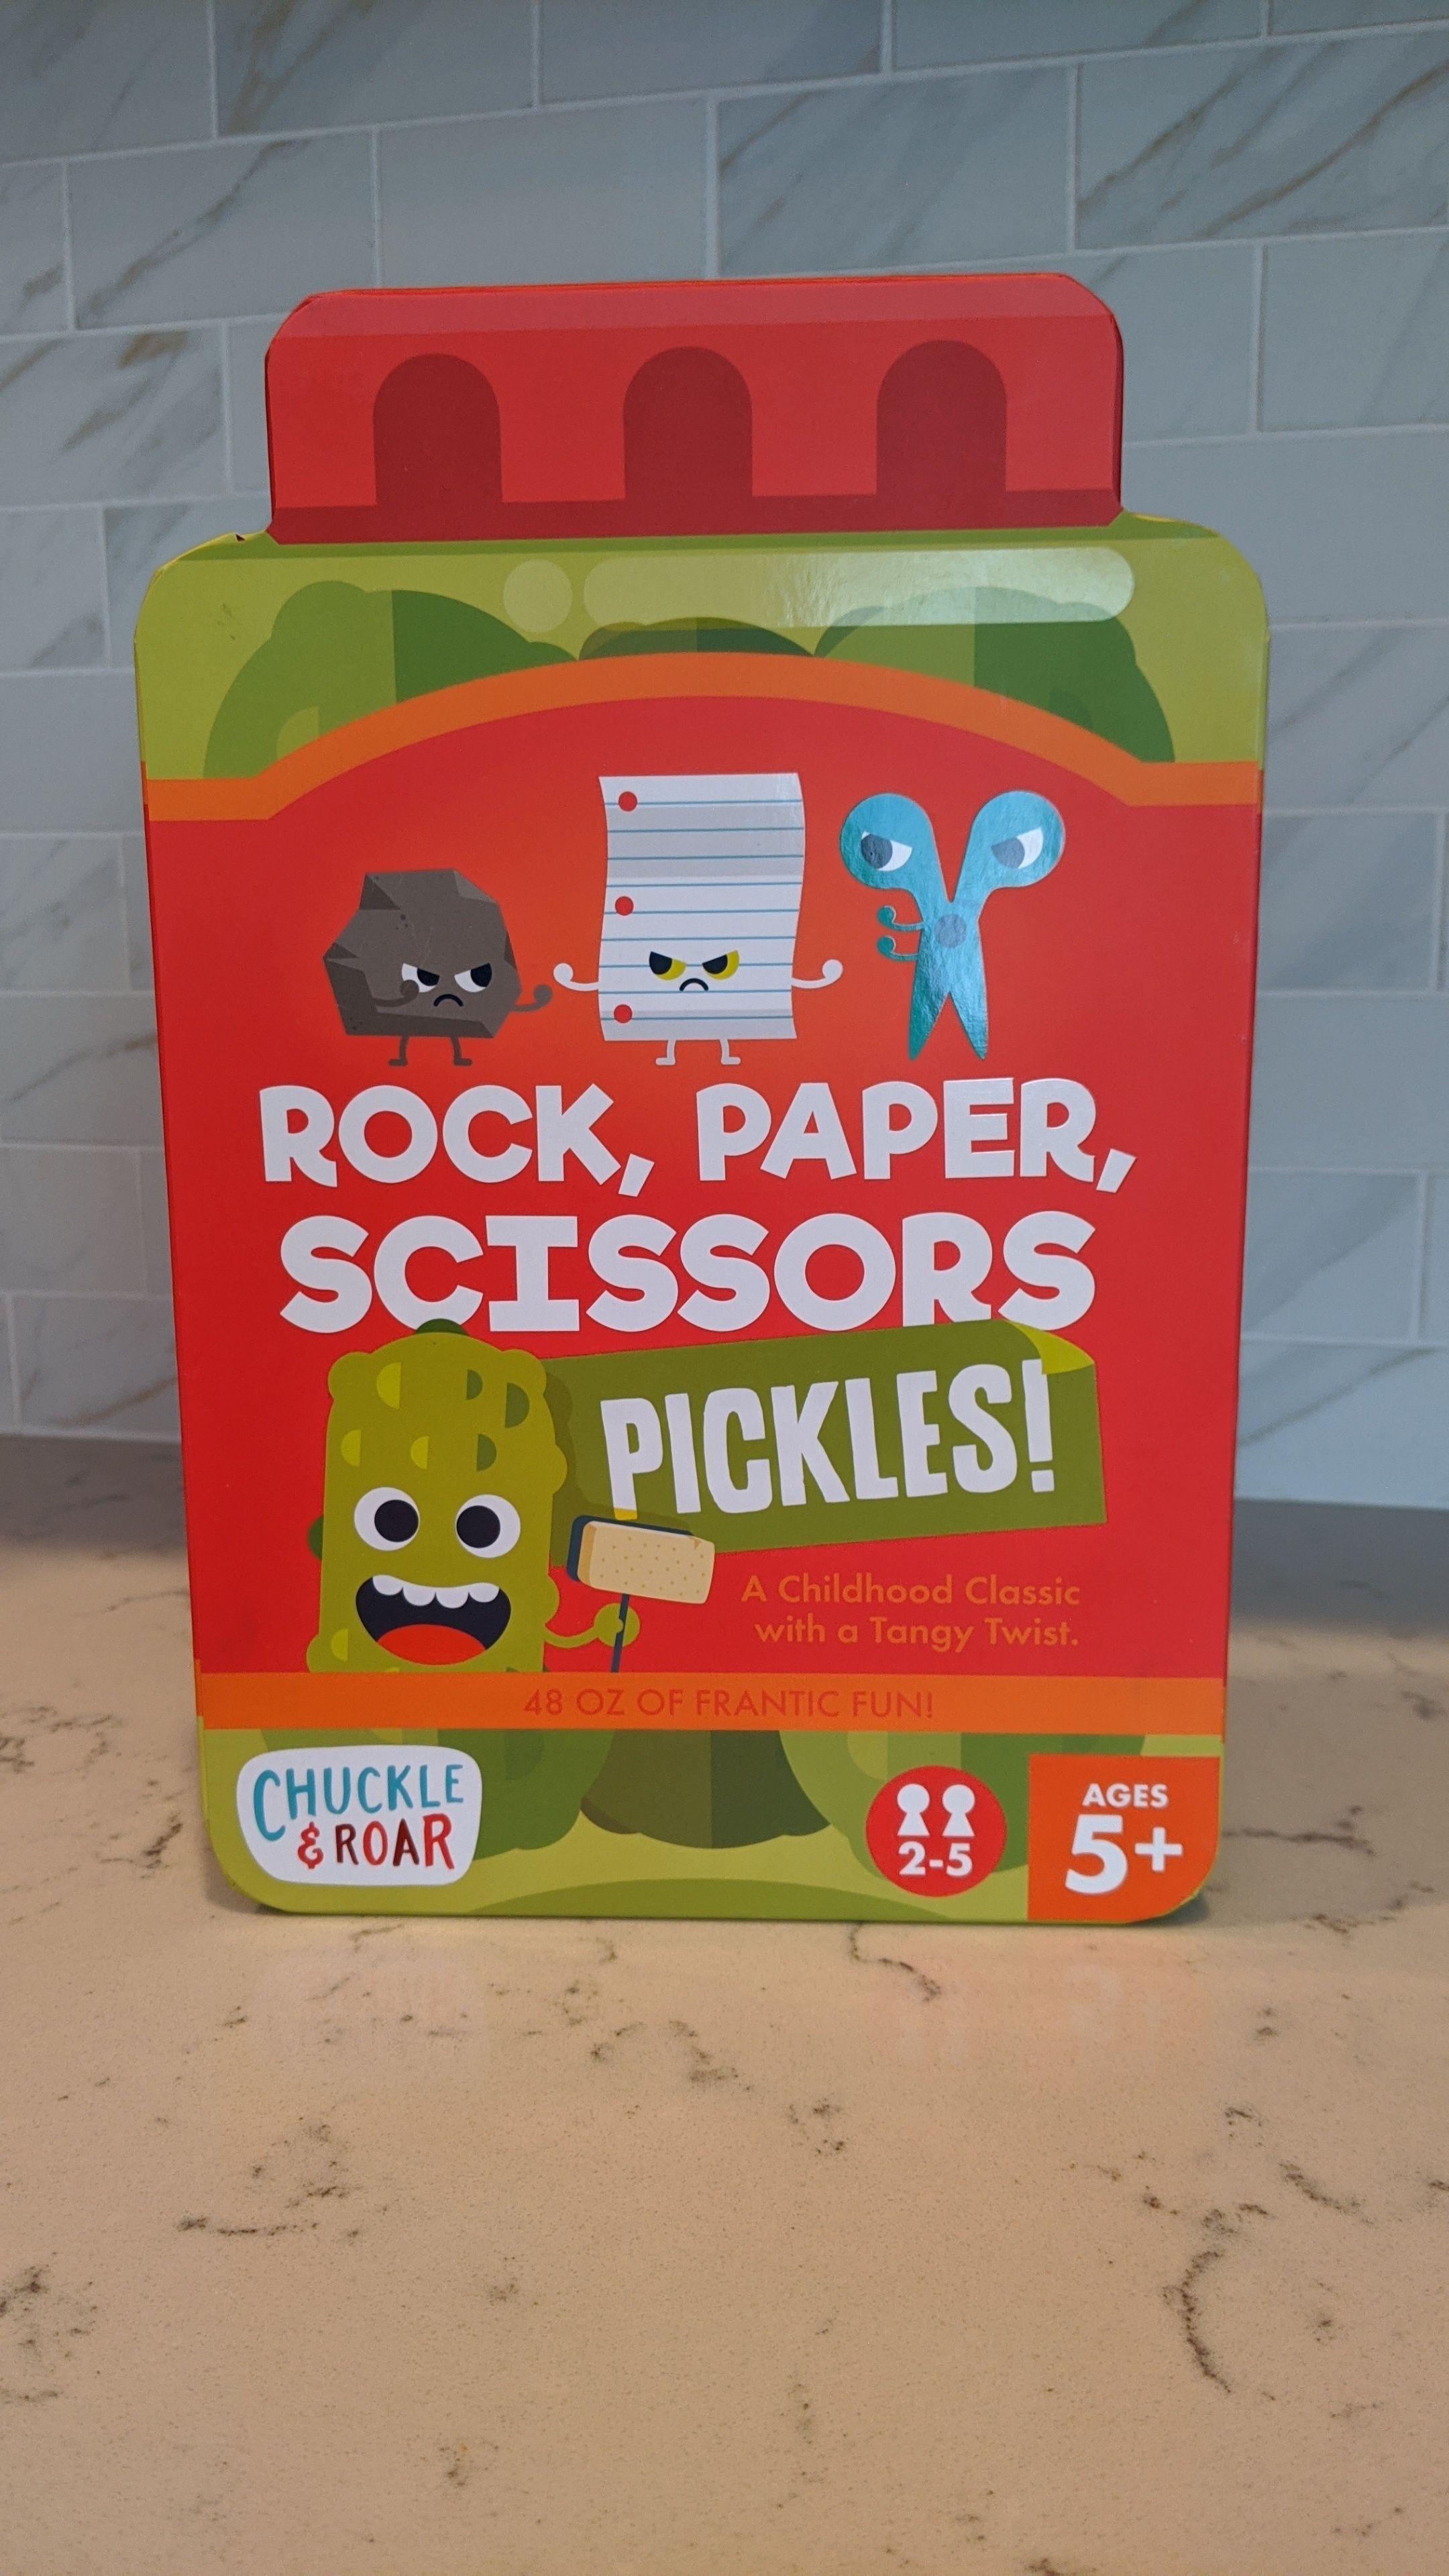 Rock, Paper, Scissors, Pickles